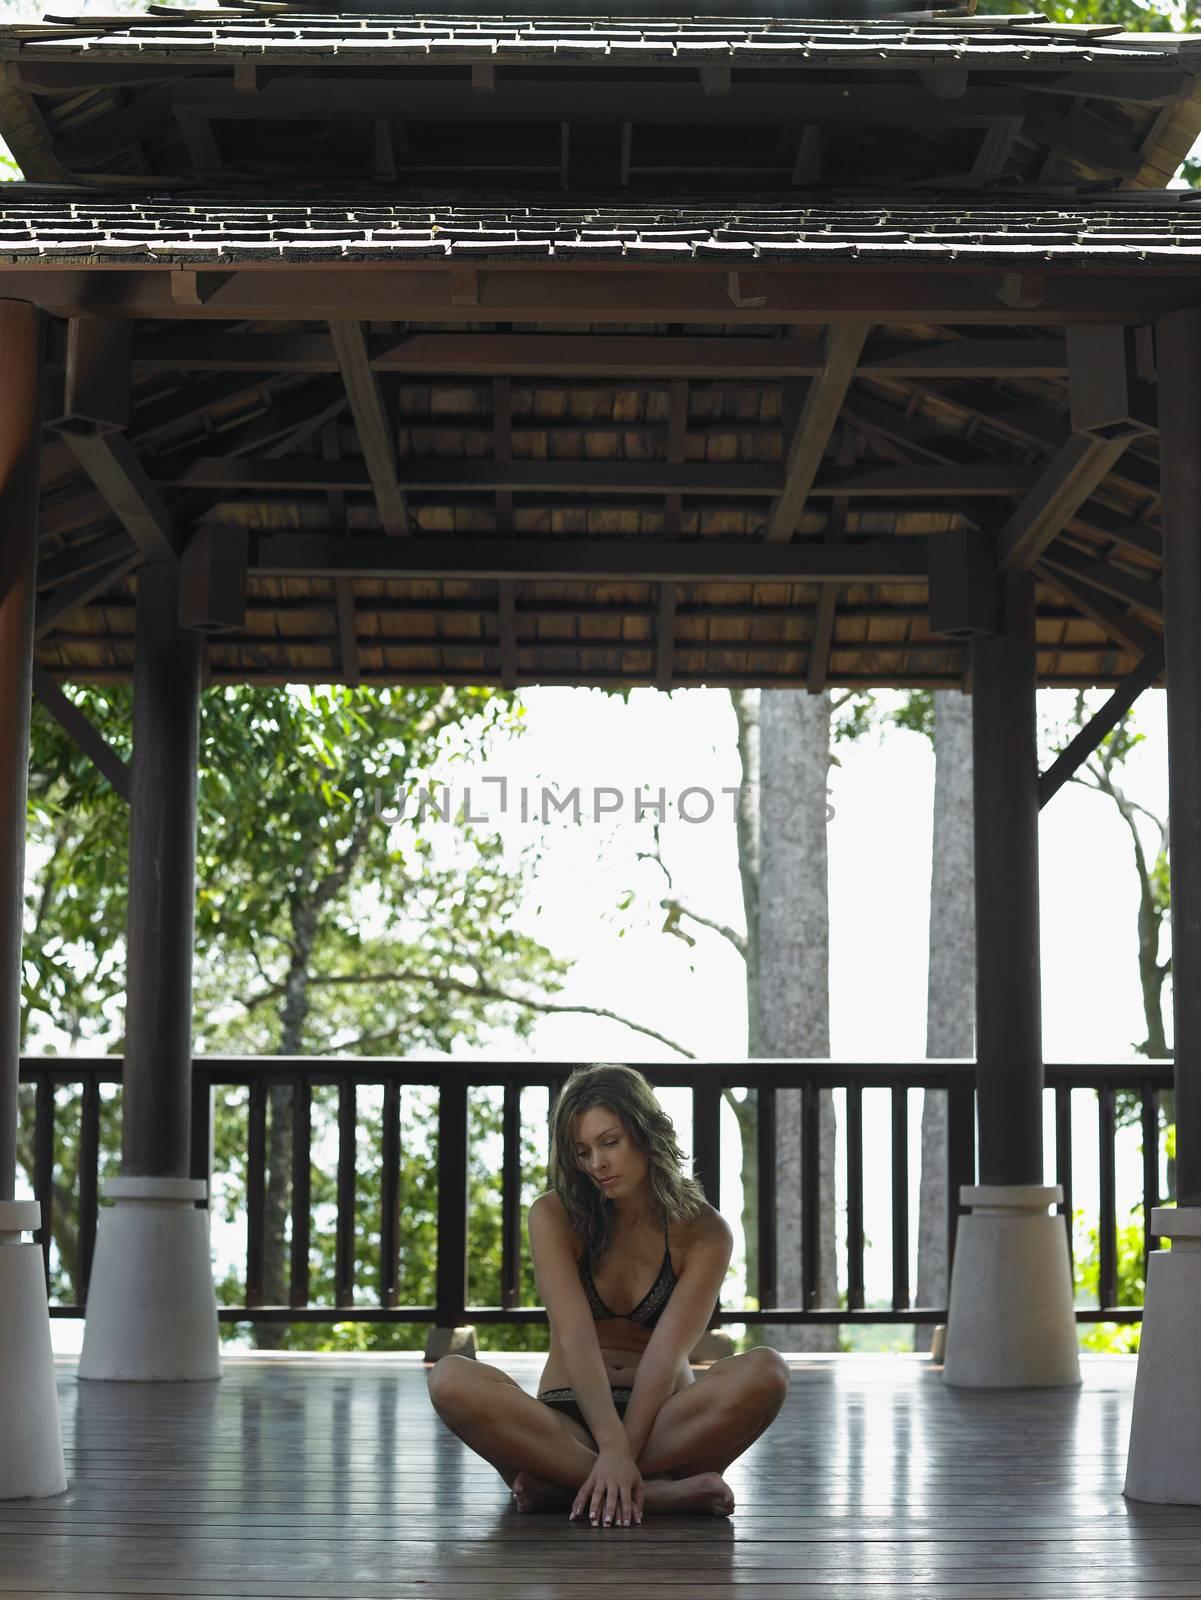 Thailand young woman in bikini sitting on floor